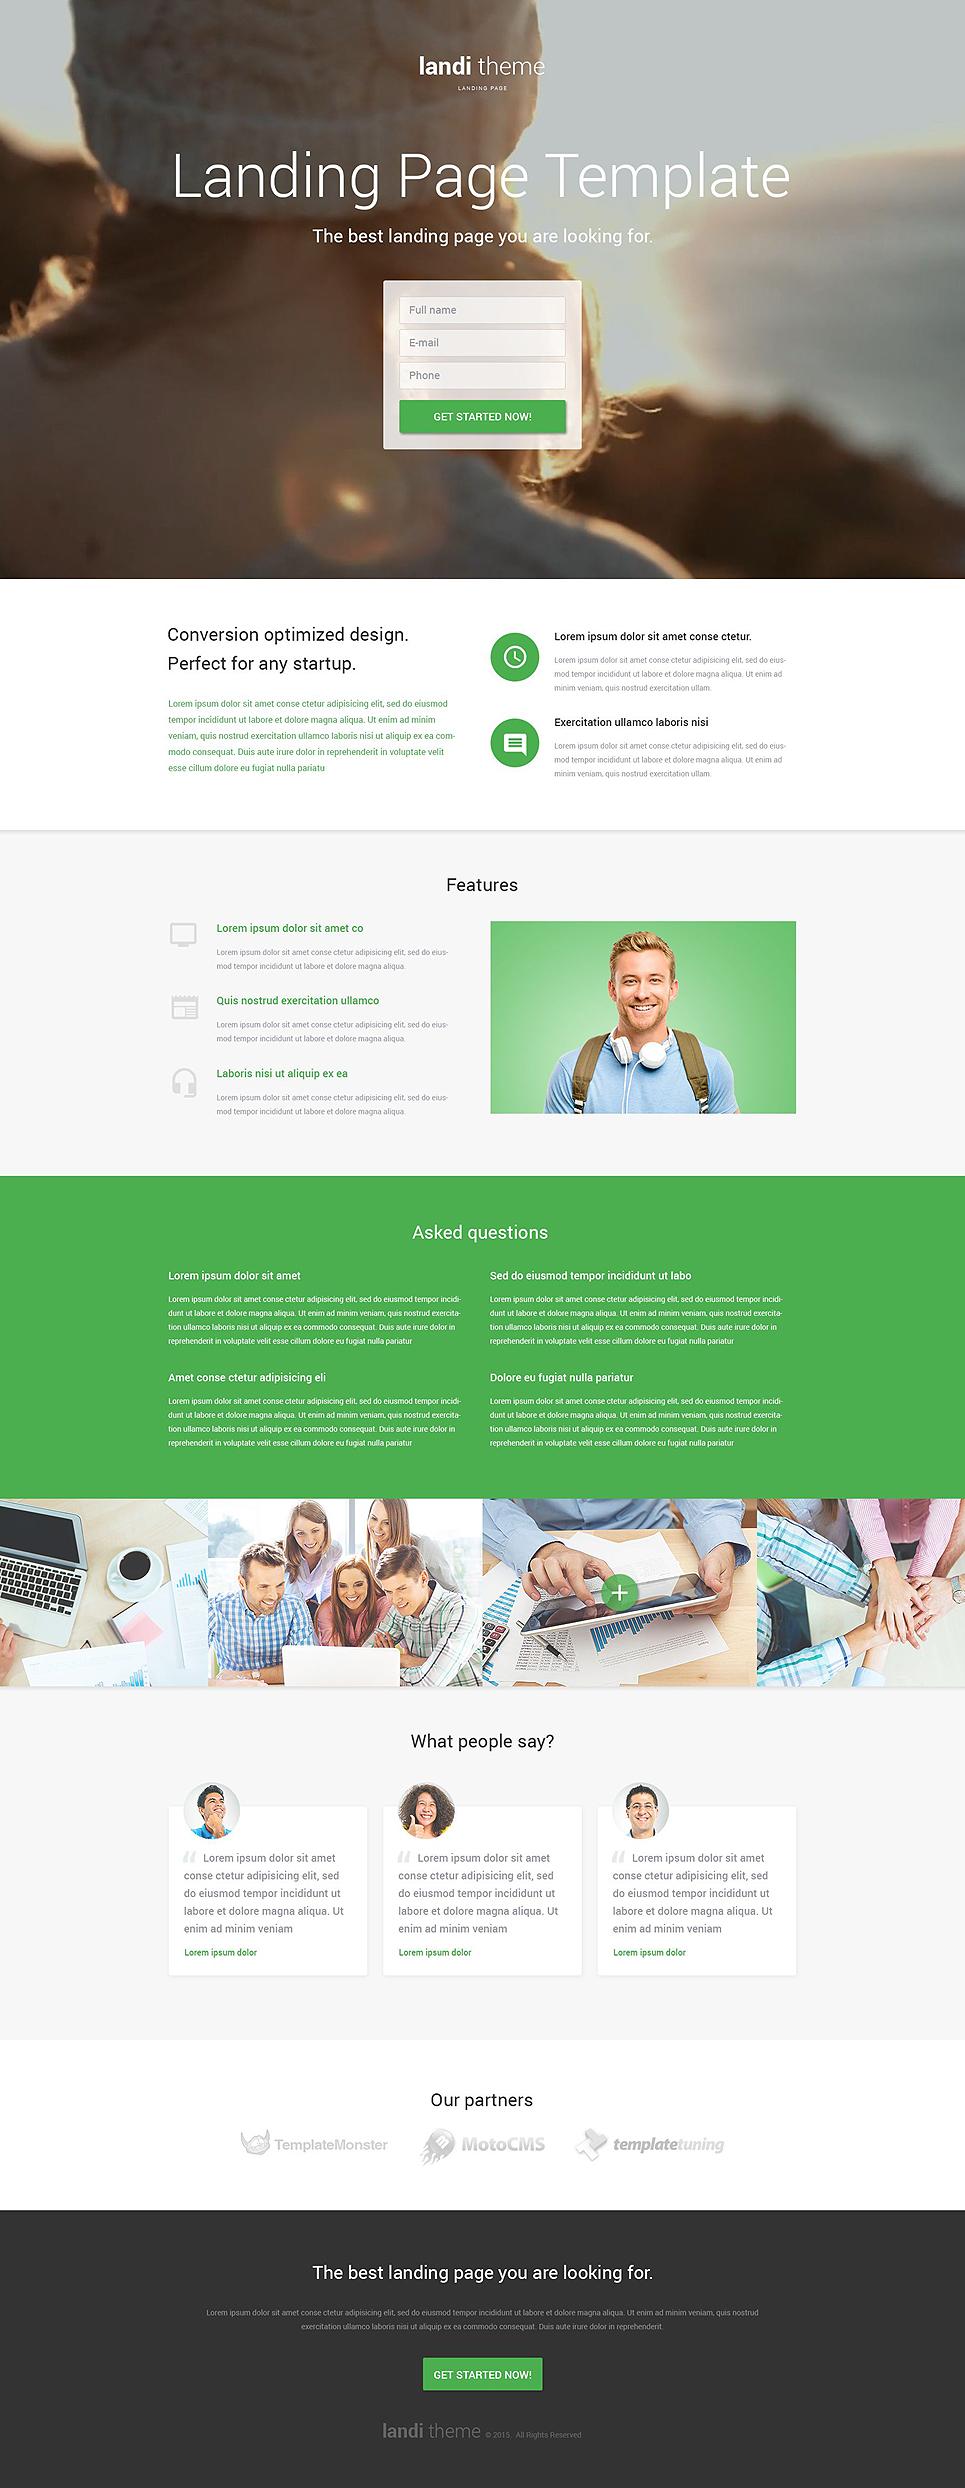 Web Development Responsive Landing Page Template 53378